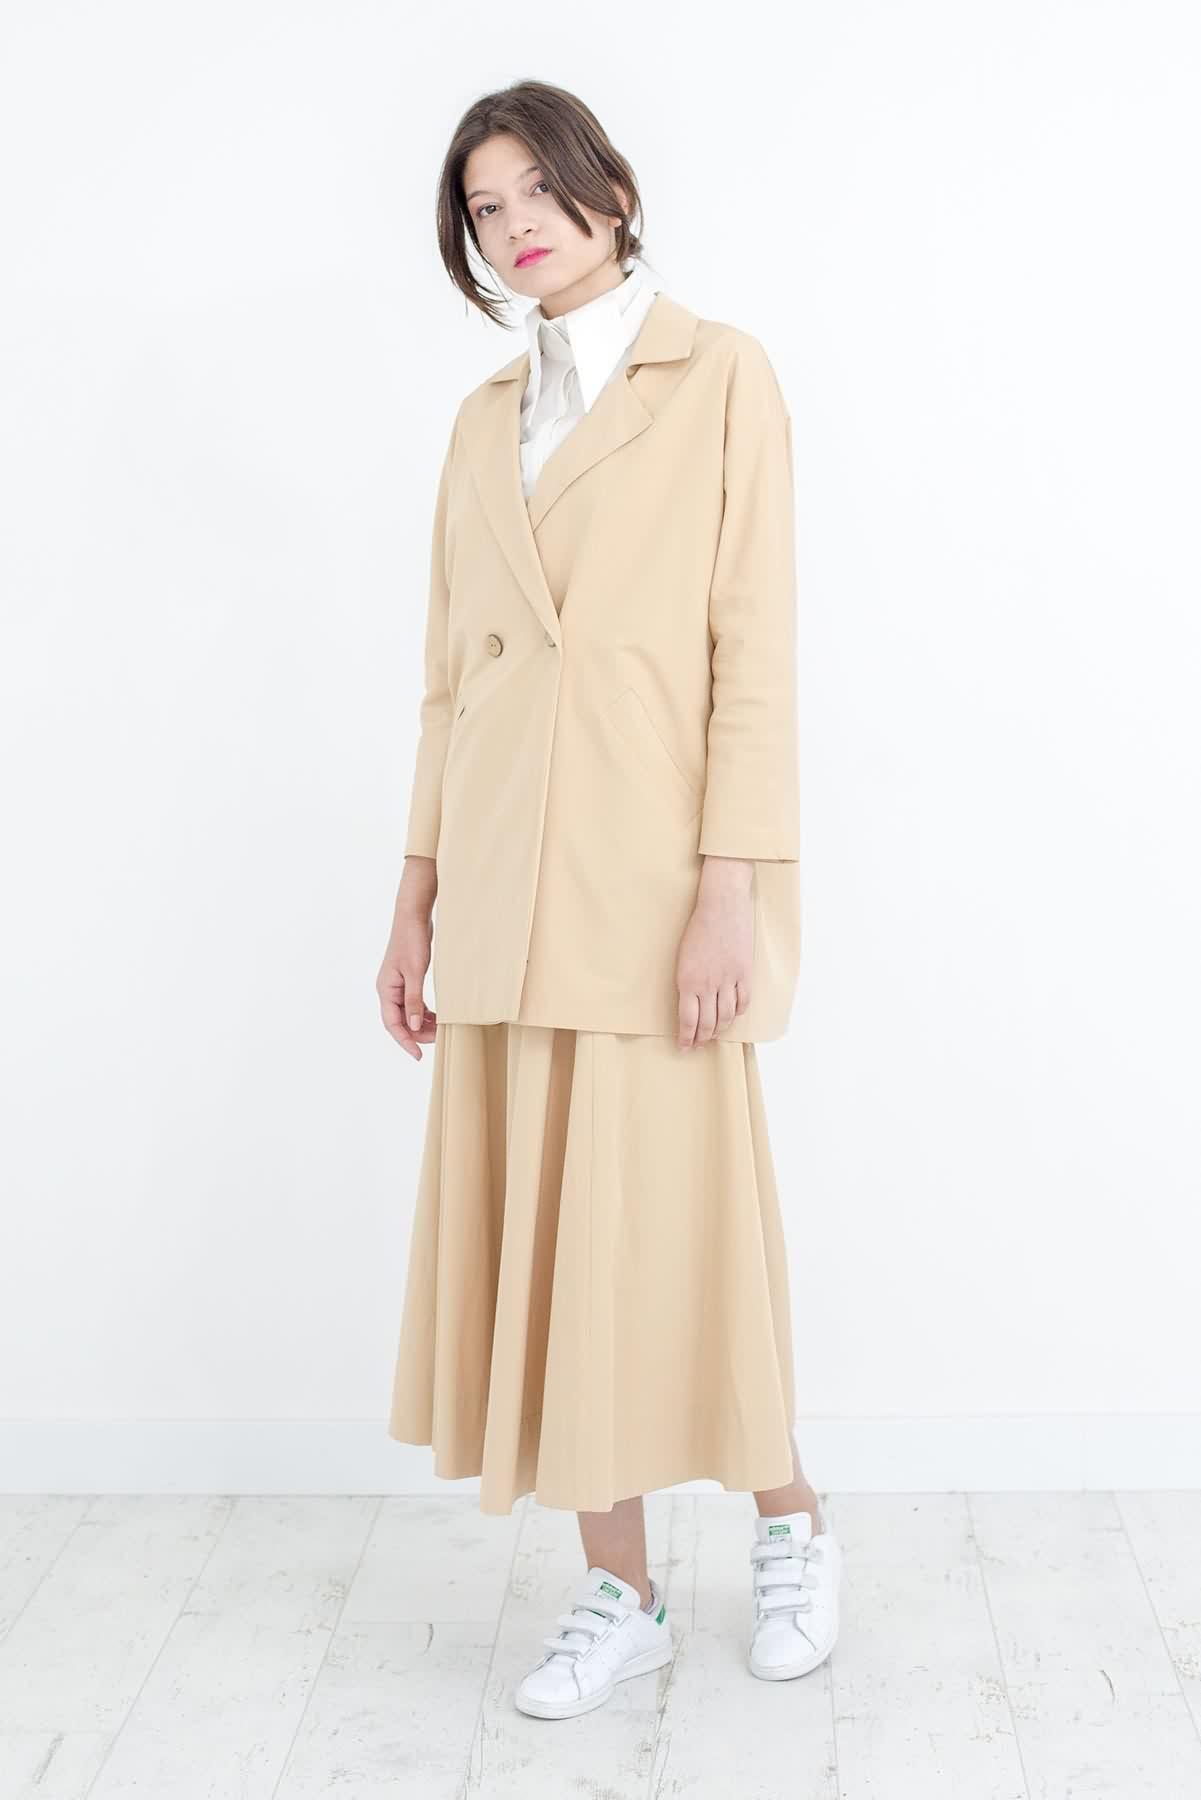 Mevra - Blazer Ceket Bej